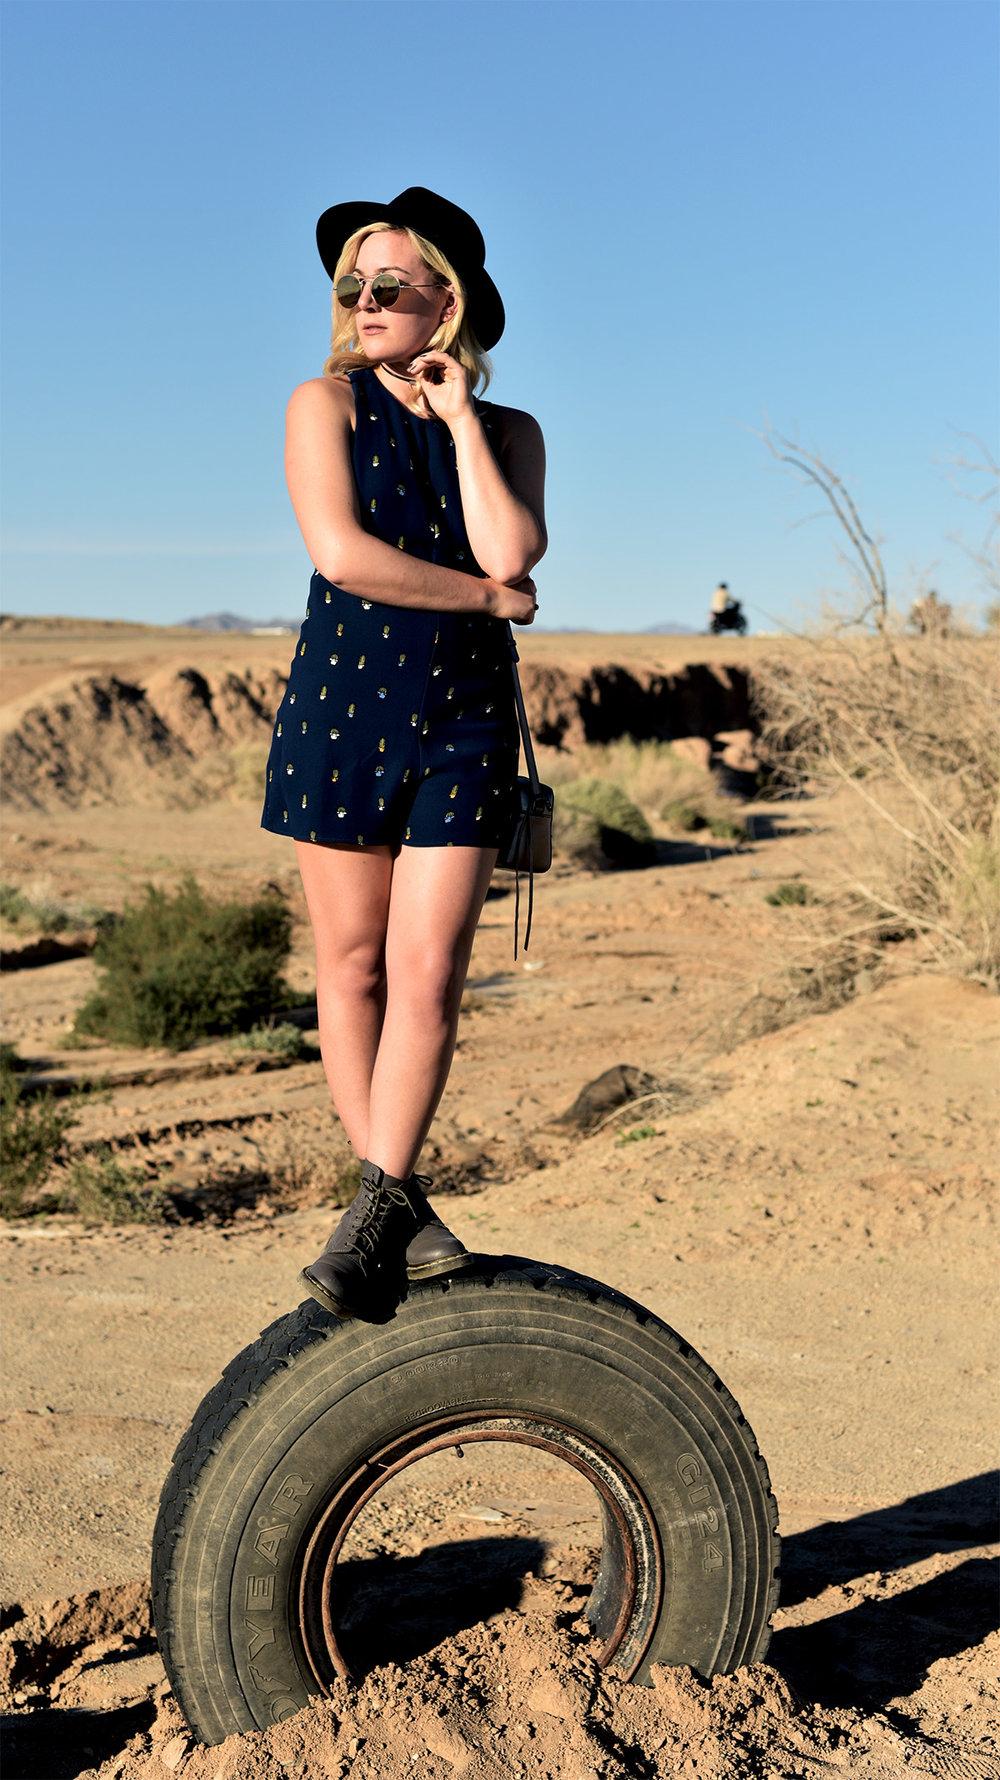 Zara-romper-Doc-Marten-boots-Faith-in-Style-8.jpg